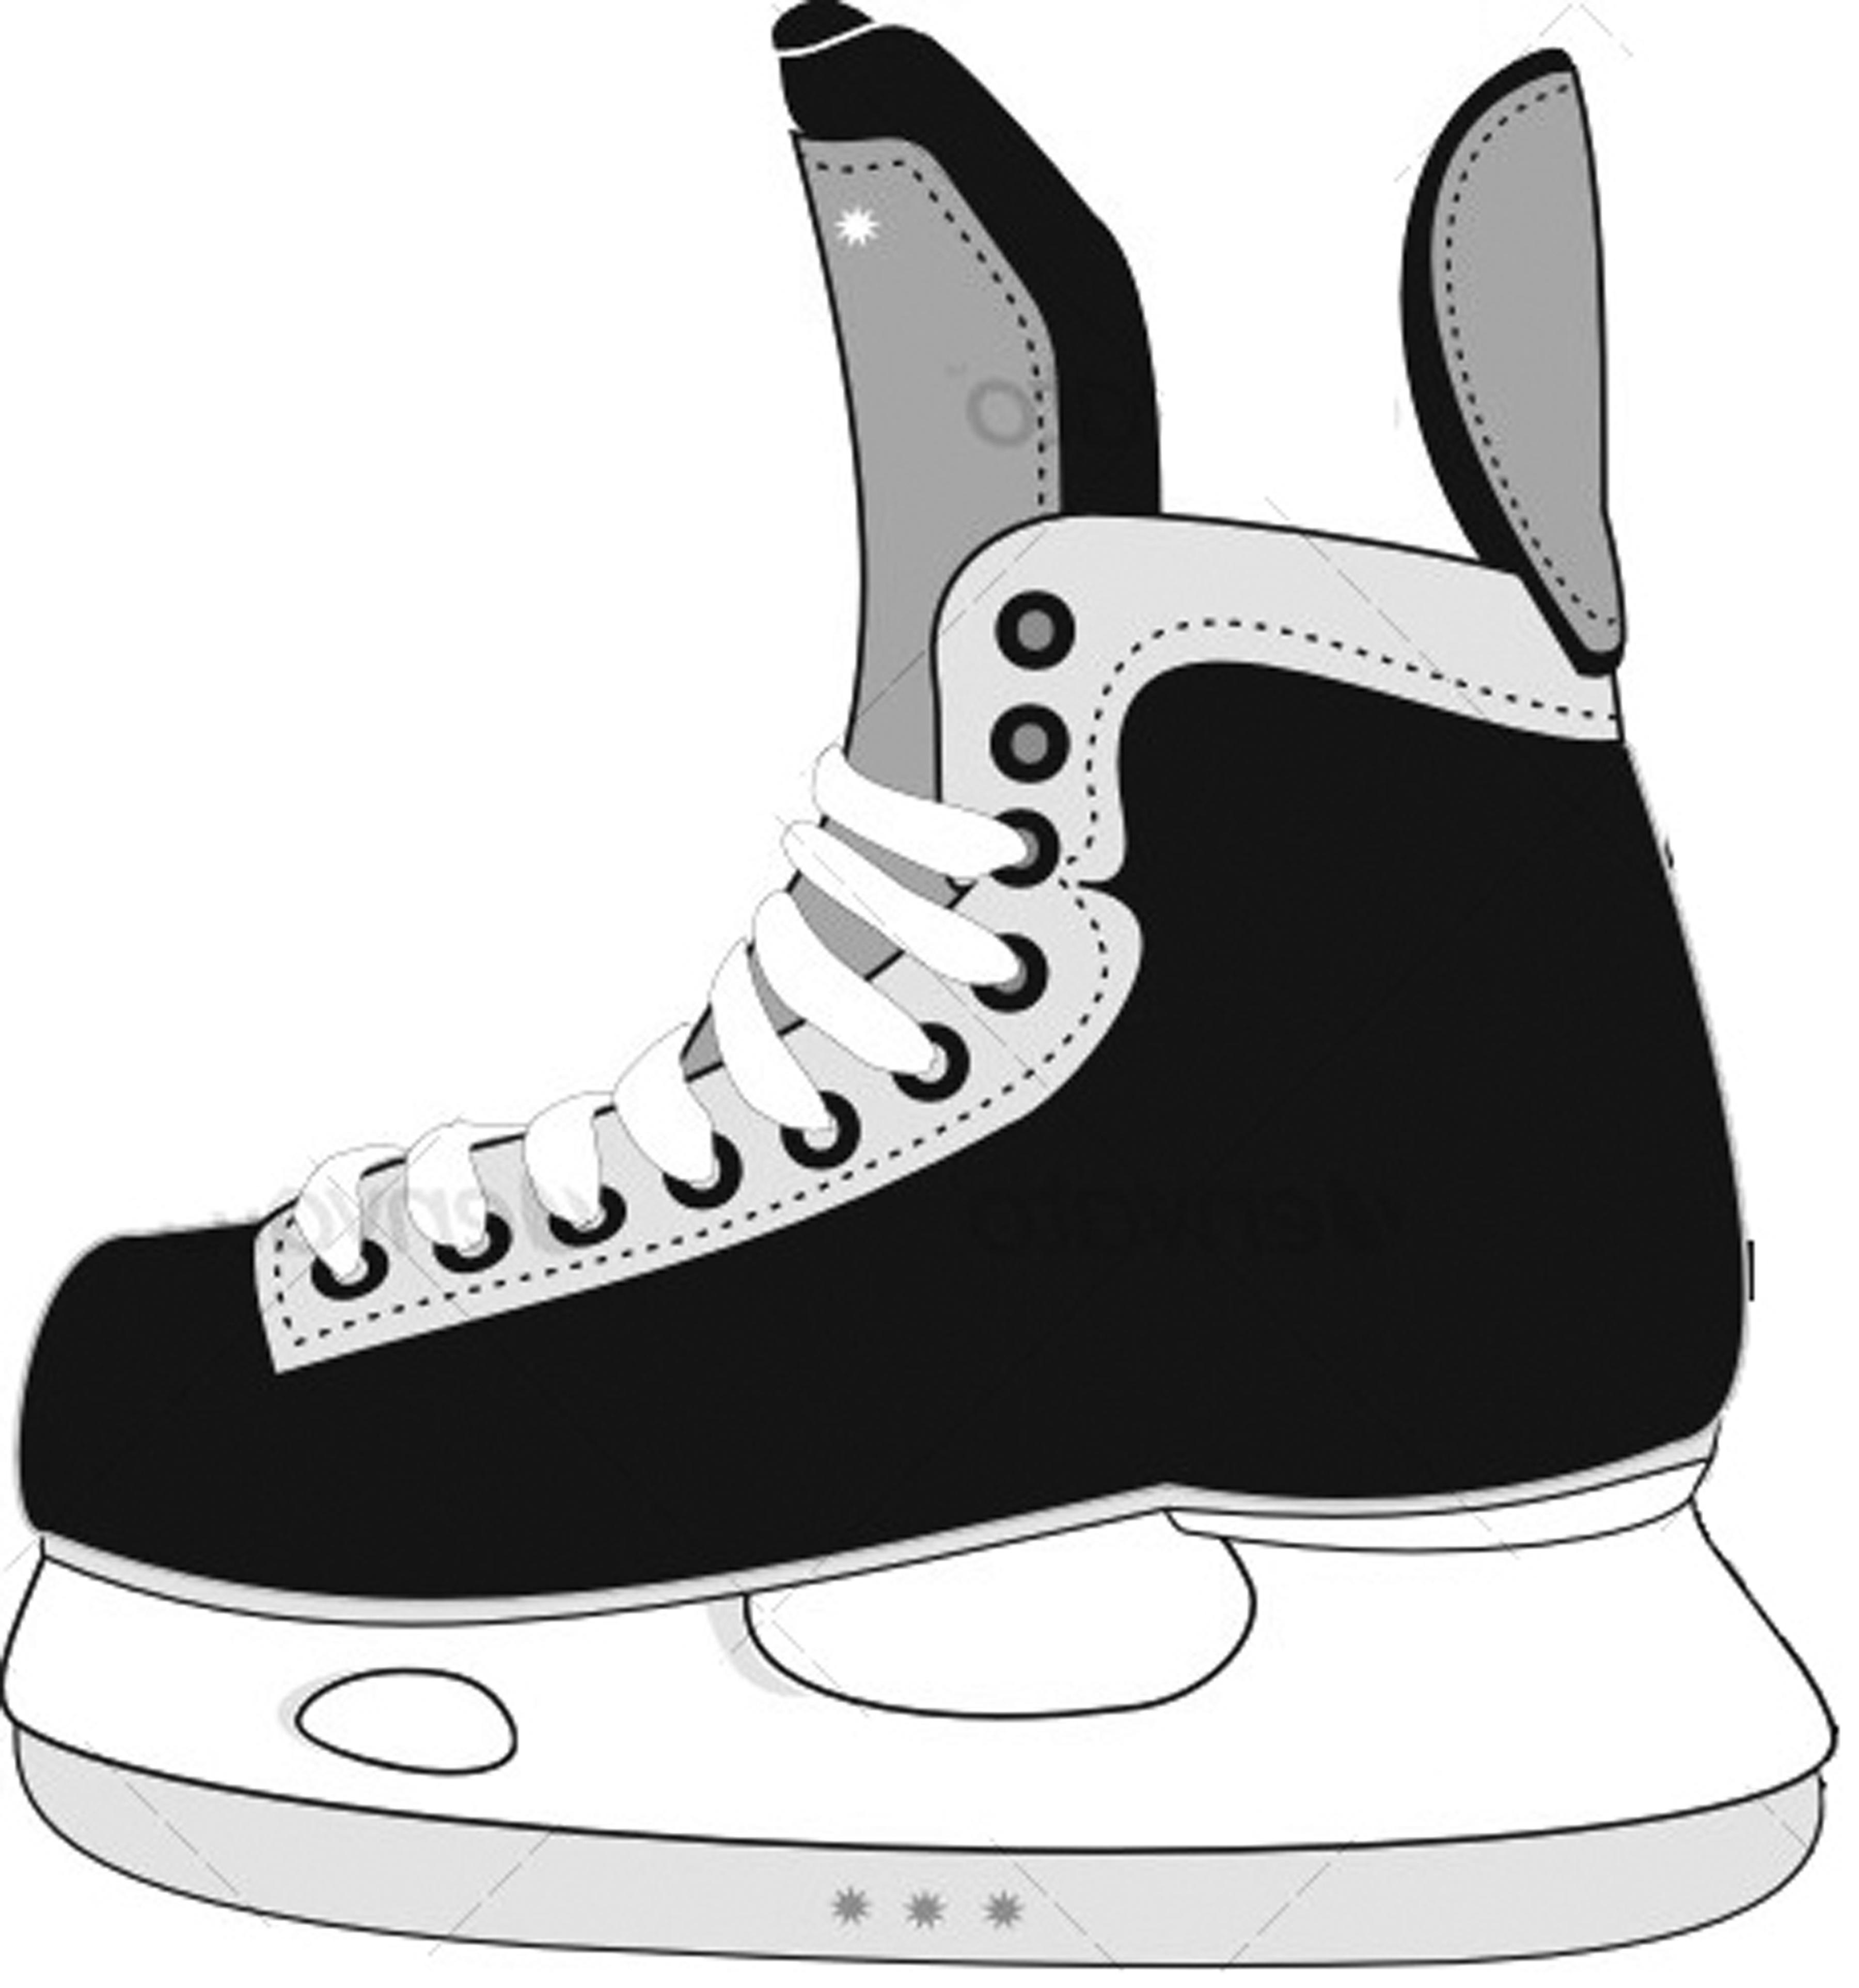 Displaying 20 Images For Cartoon Hockey Skates